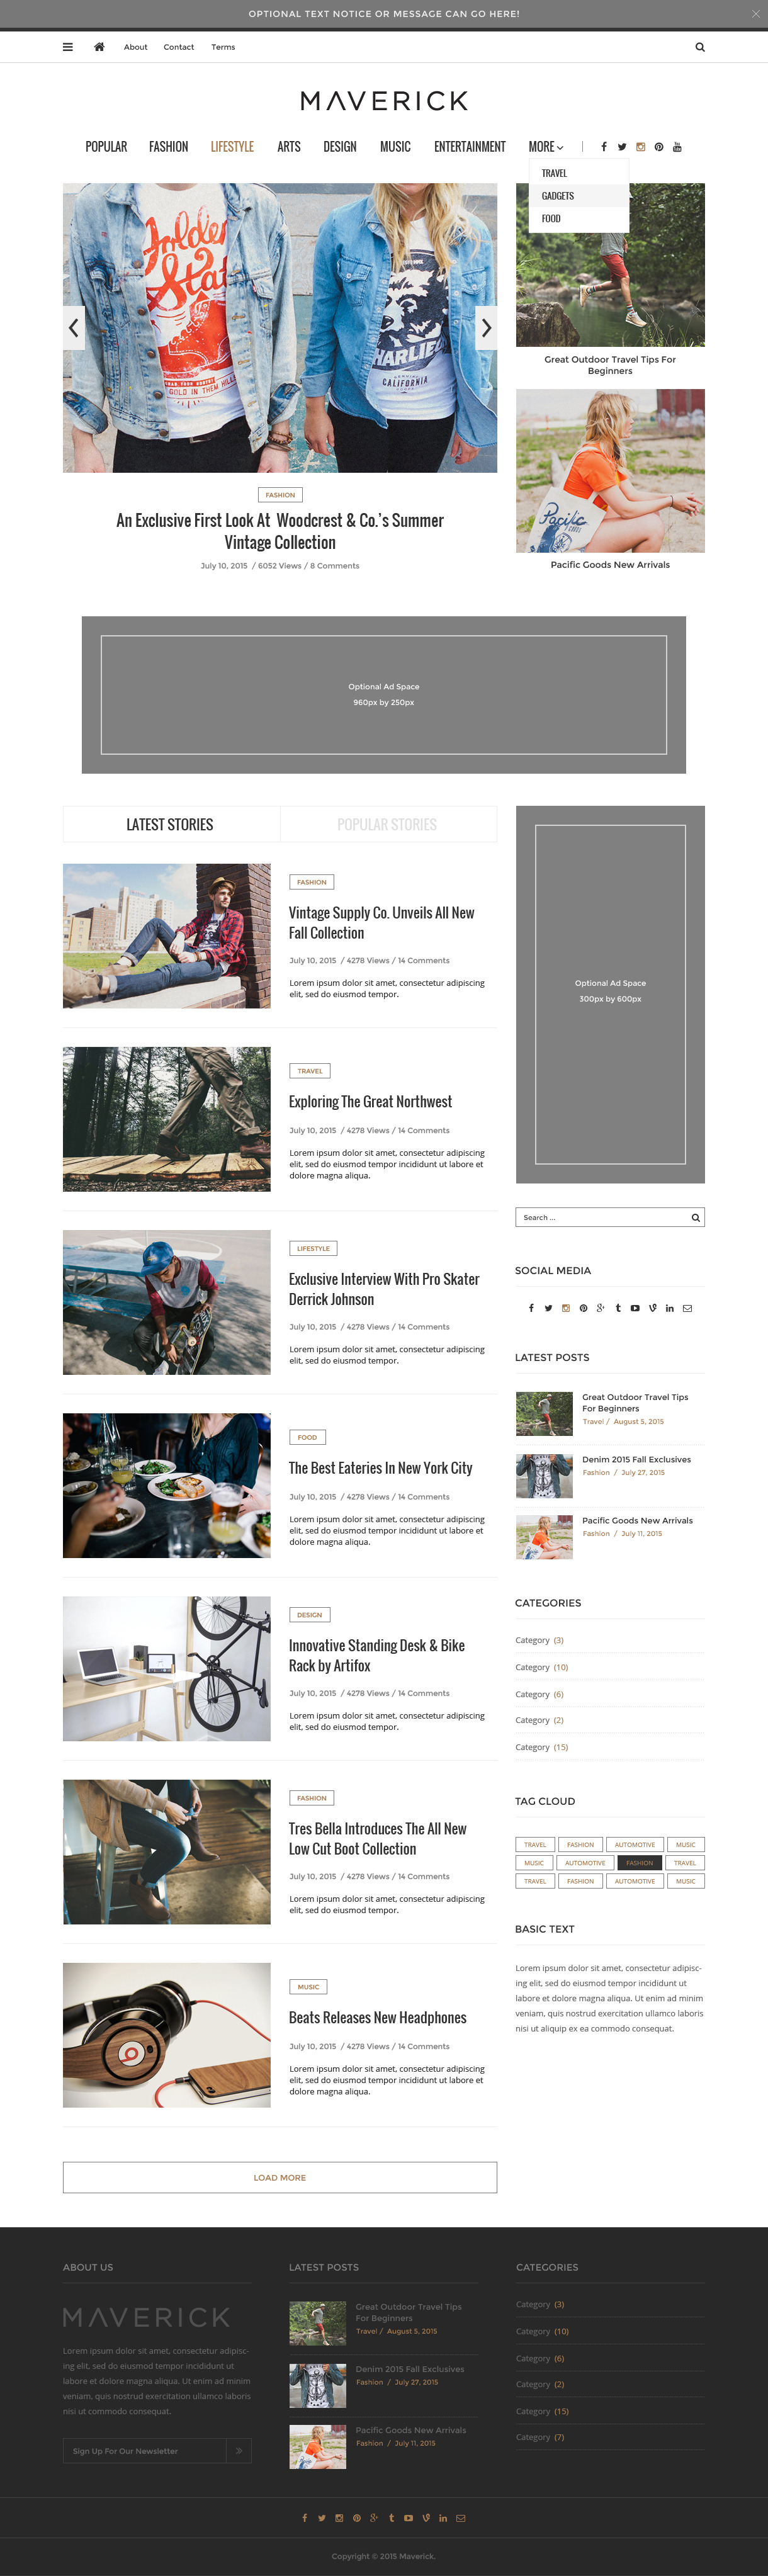 Maverick minimalist blog magazine psd by seaboardthemes for Minimalist house list